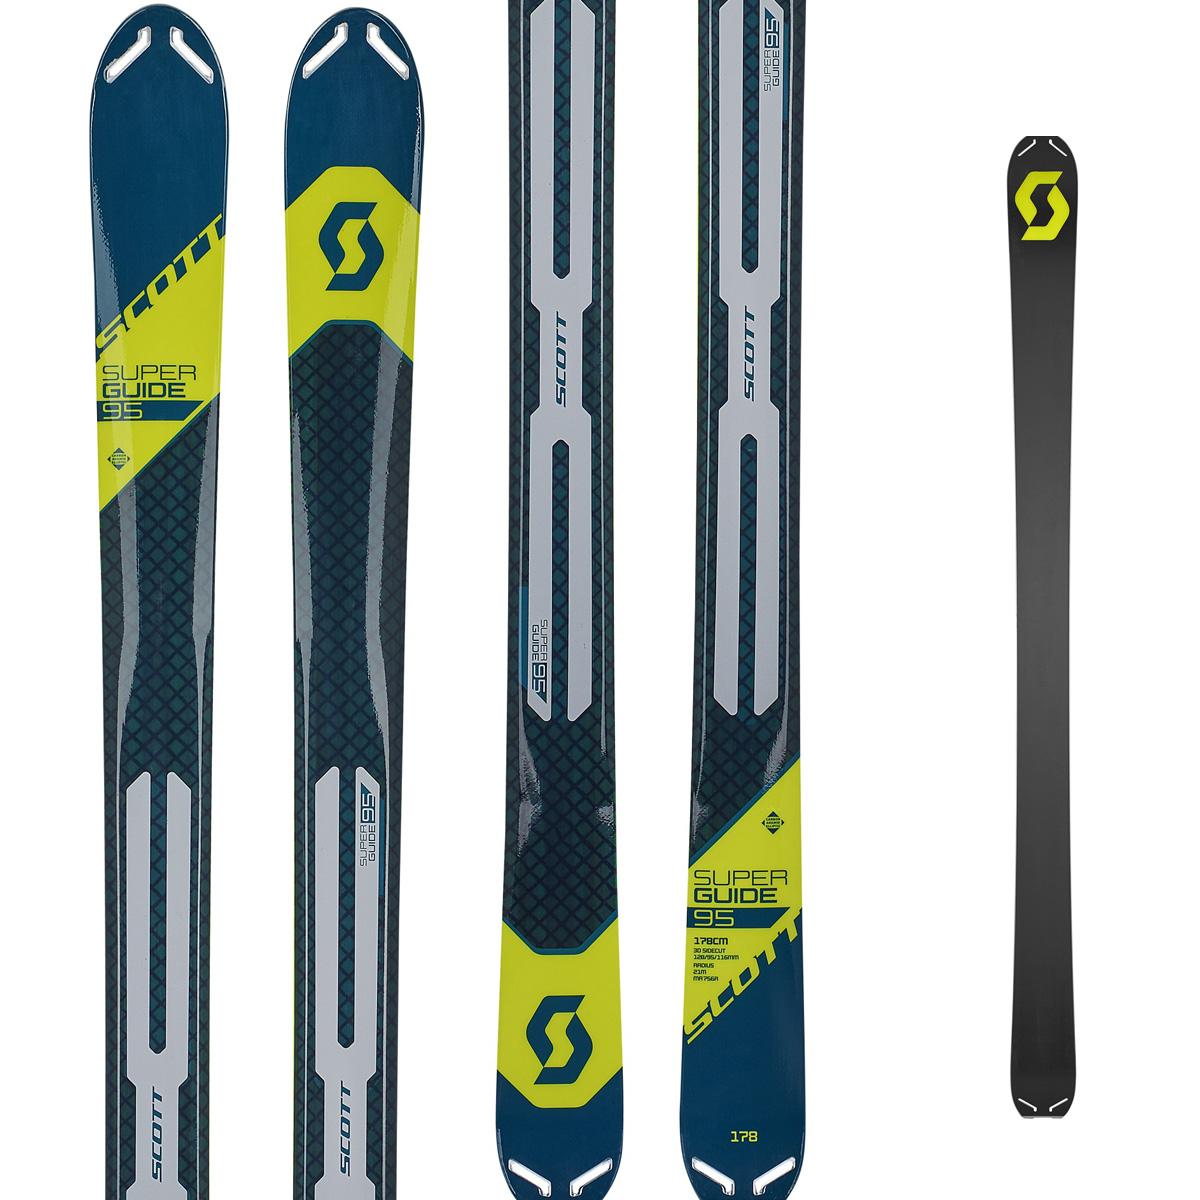 SCOTT SCO Ski Superguide 95 9992 A version 168